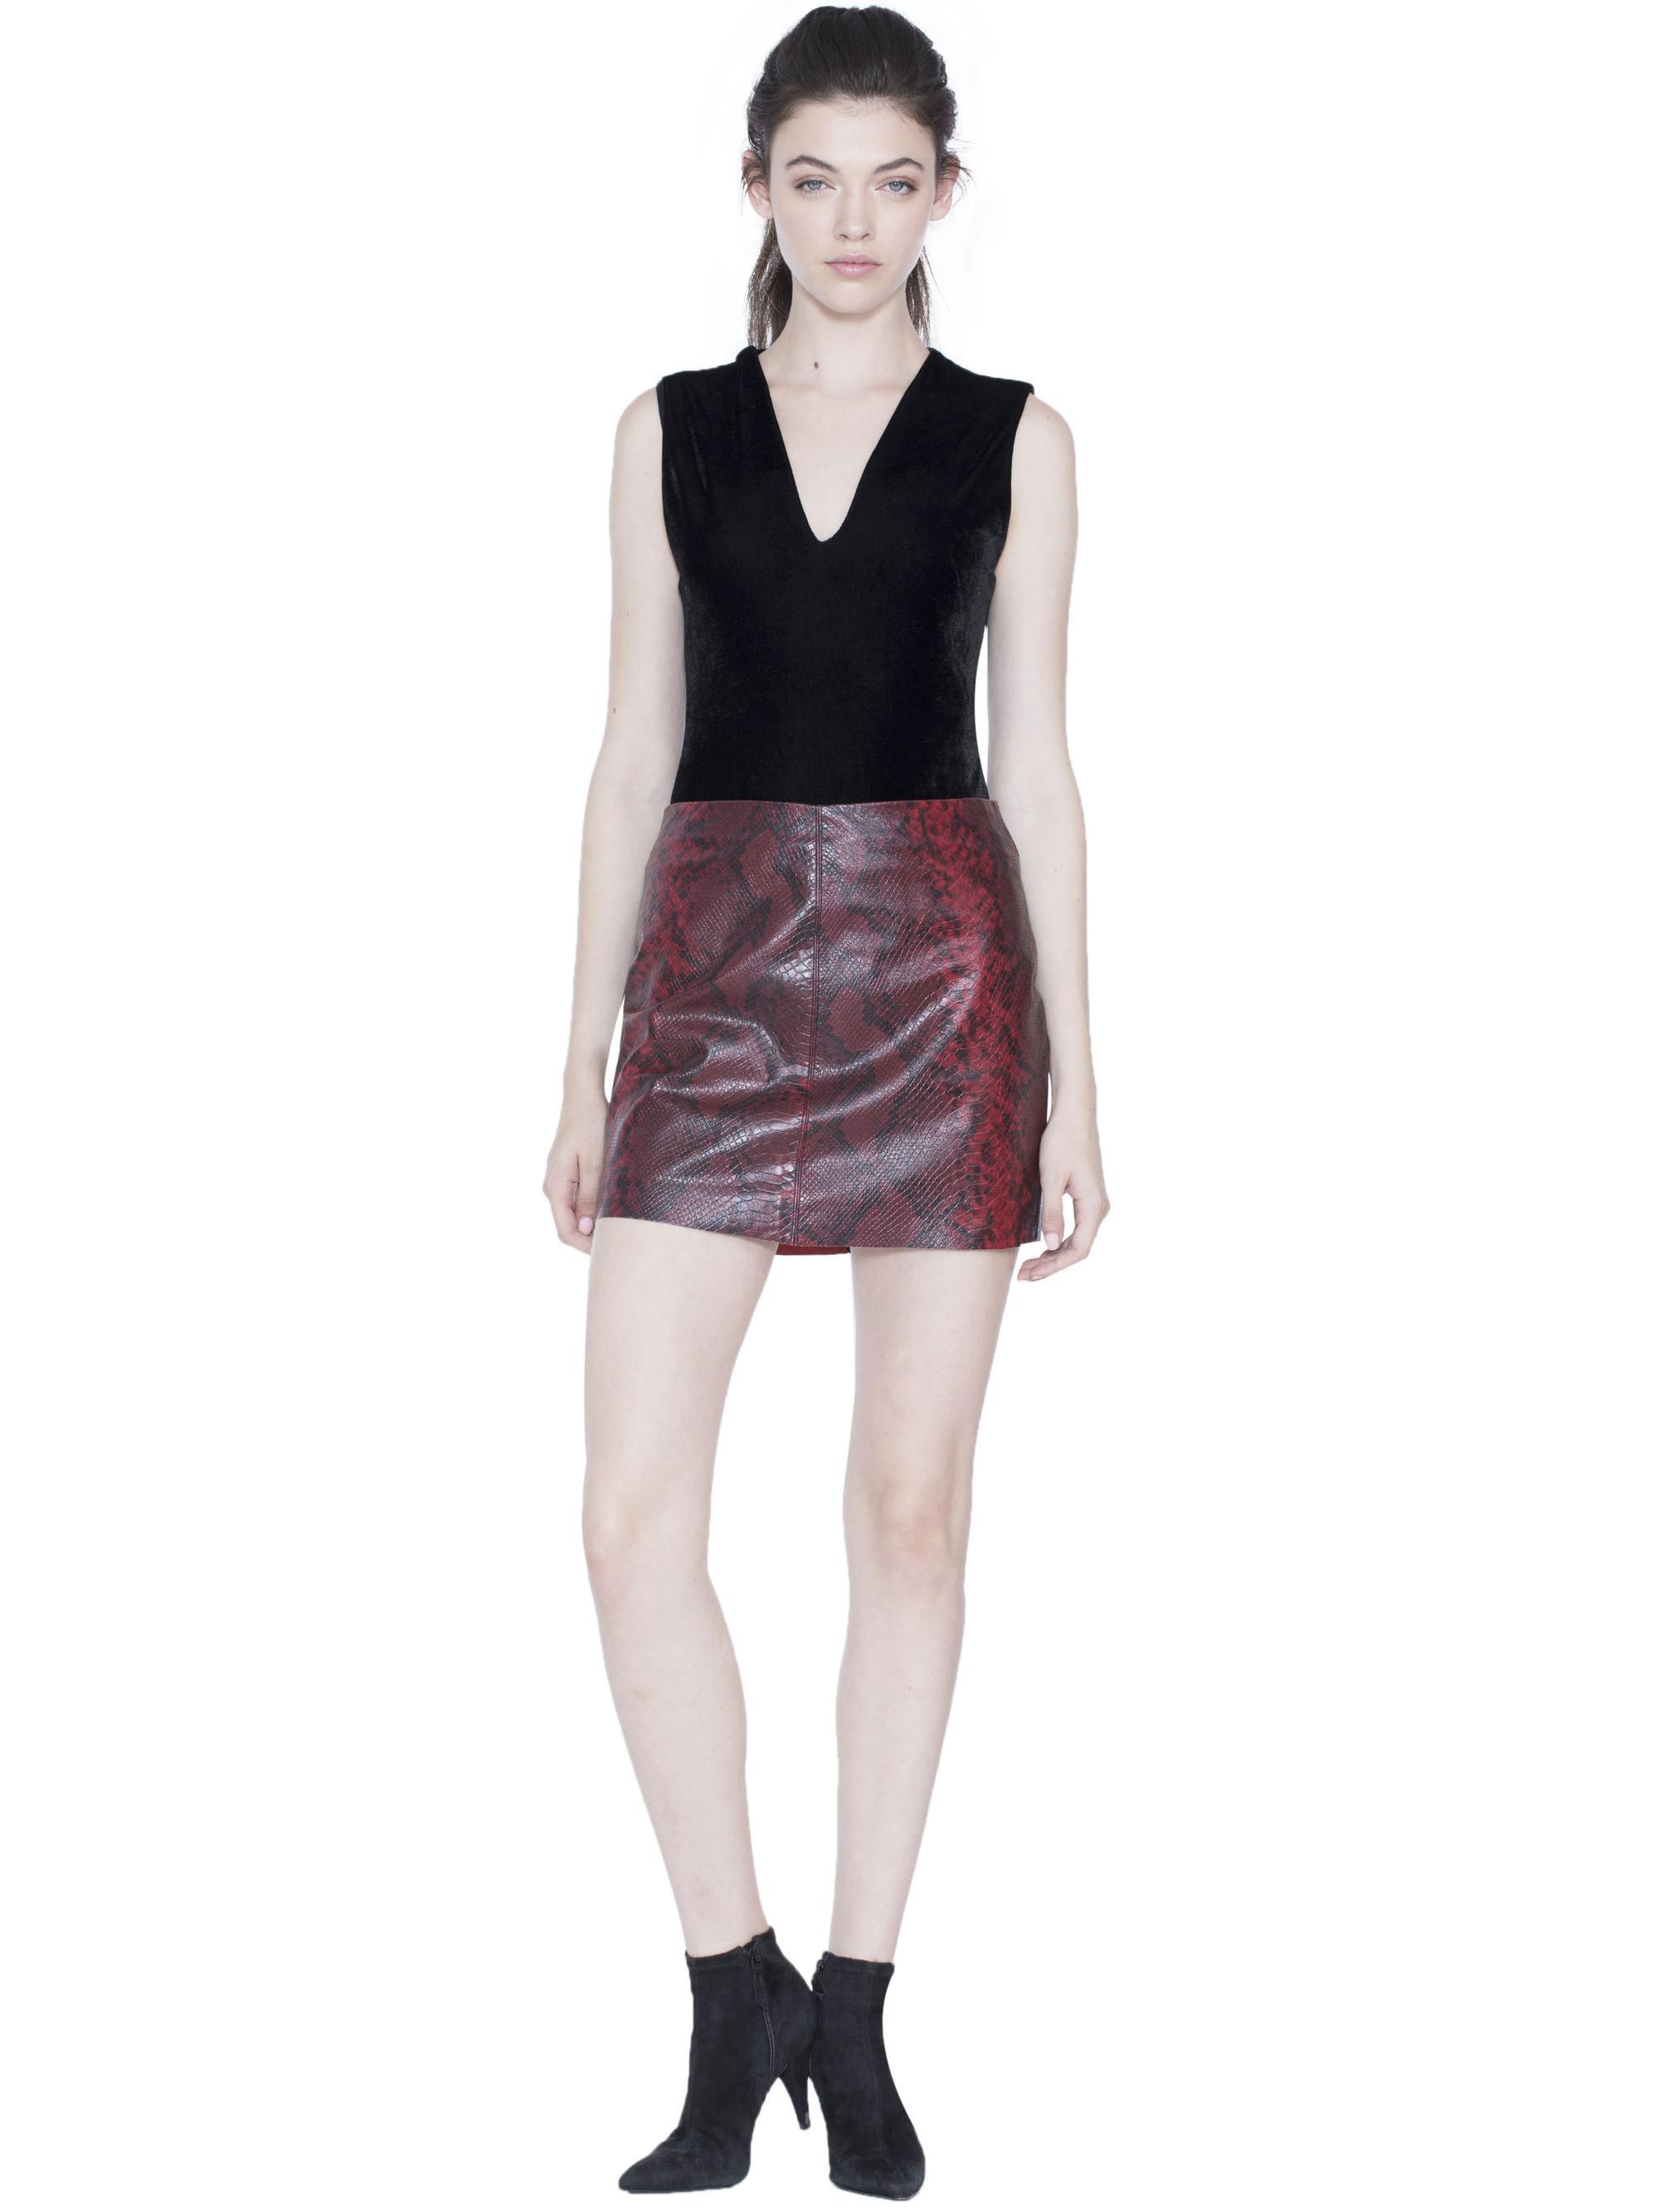 0cb9cf8f2a107 Lyst - Alice + Olivia Marley Vneck Sleeveless Bodysuit in Black